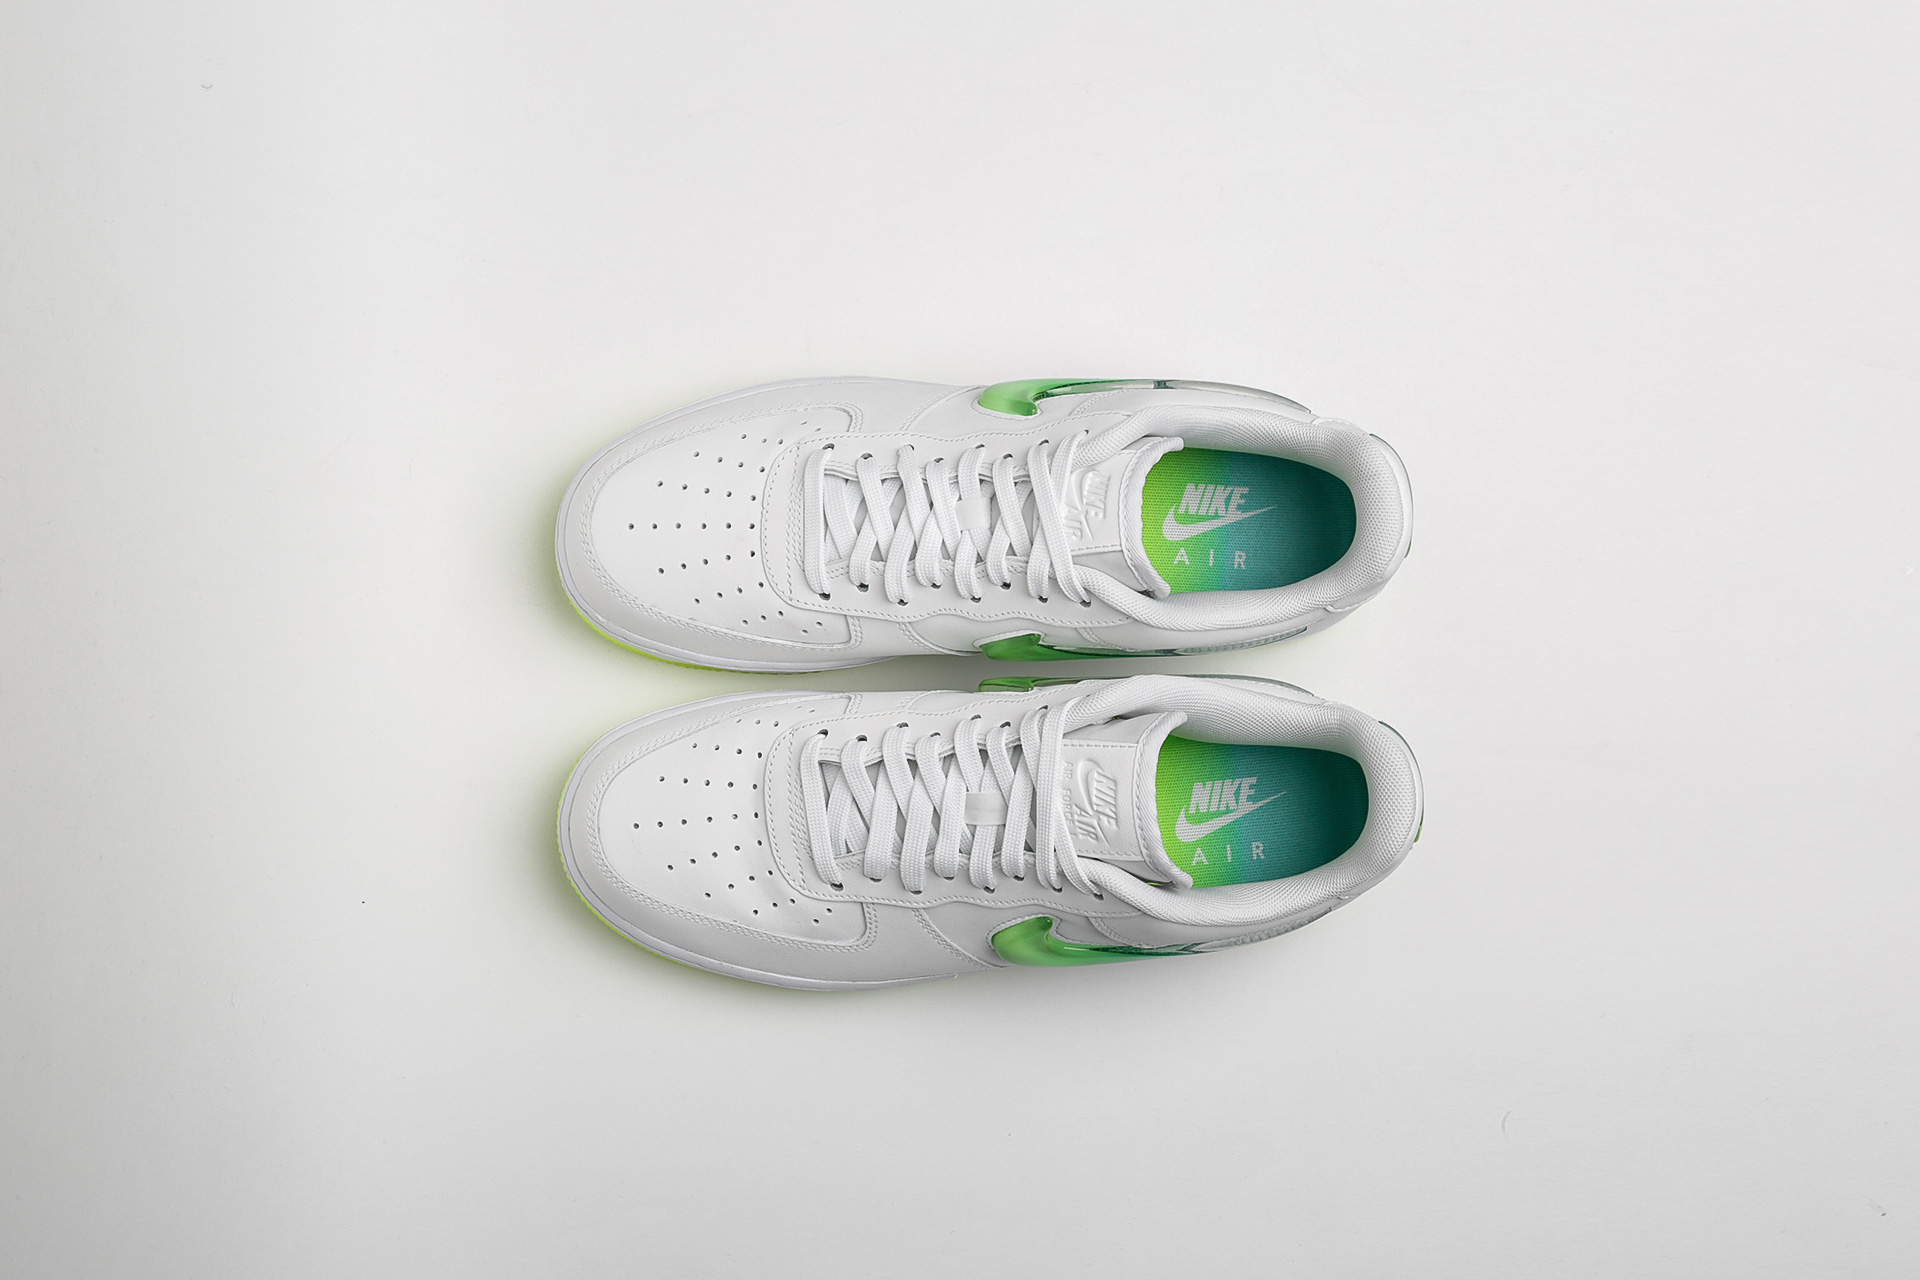 e3db5abe ... Купить мужские белые кроссовки Nike Air Force 1 '07 PRM 2 - фото 6  картинки ...